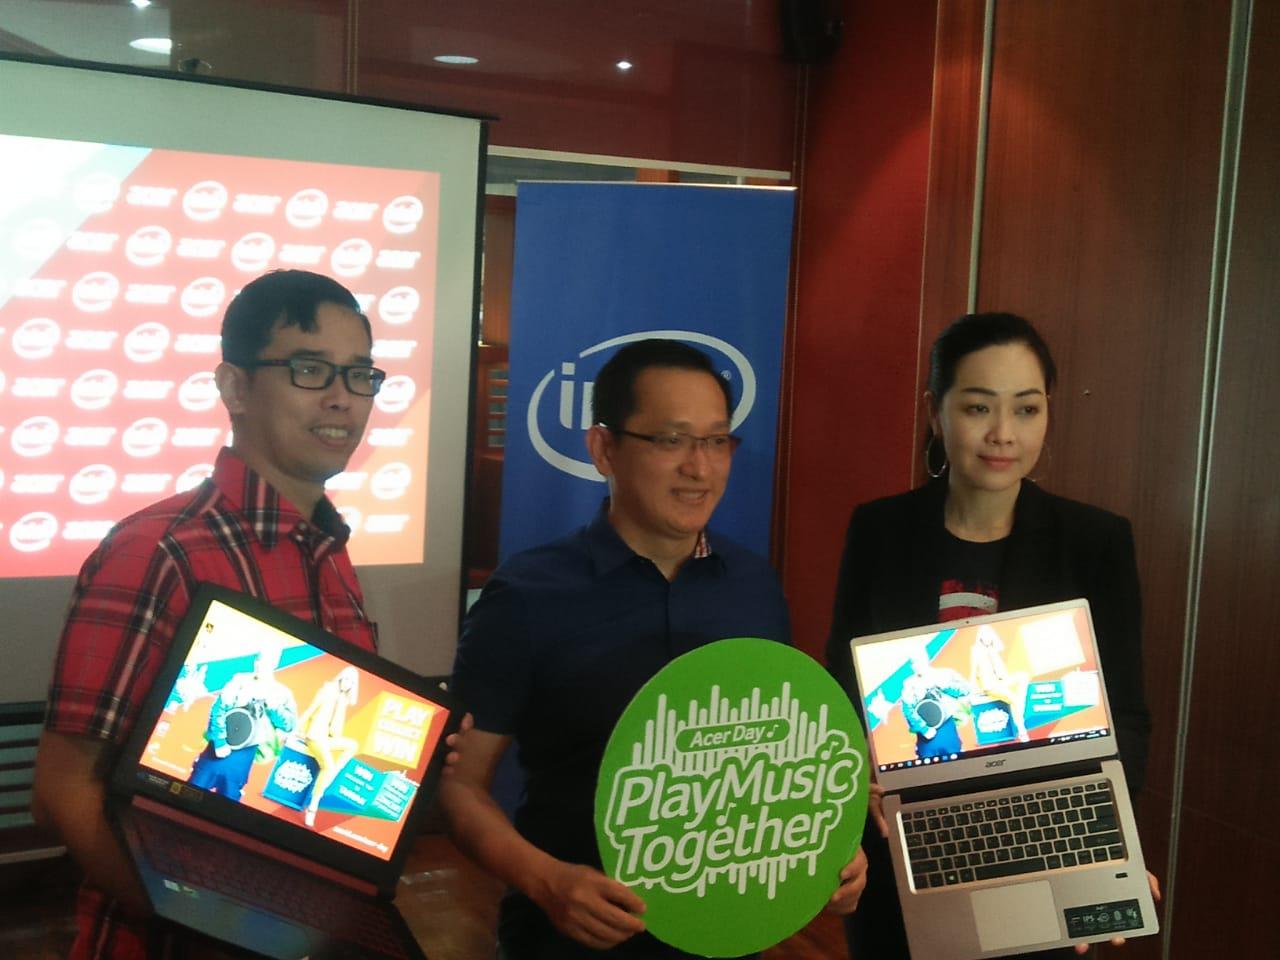 Hadirkan Swift 3 Acer Day 2018 Special Edition Gebrak Pasar Medan